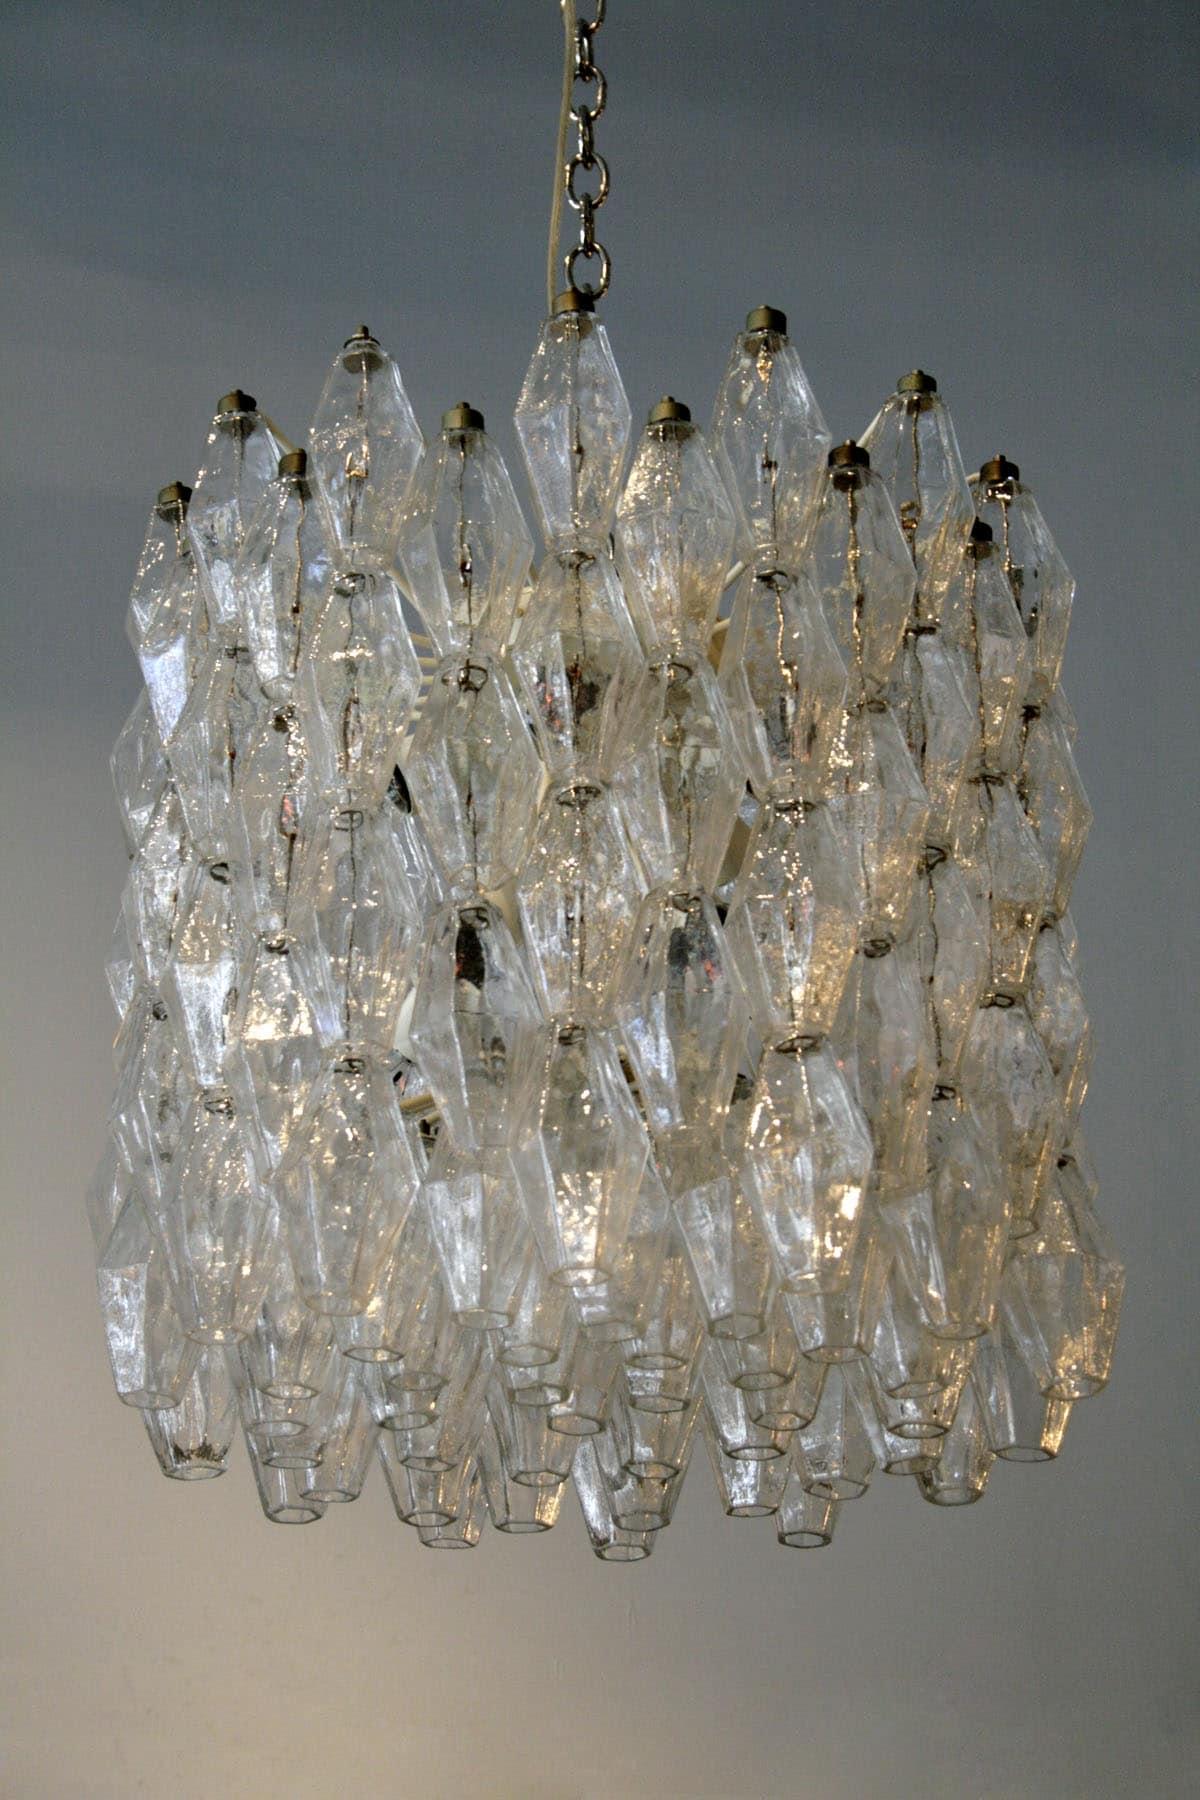 Clear polyhedral chandelier by carlo scarpa for venini todd clear polyhedral chandelier by carlo scarpa for venini aloadofball Images